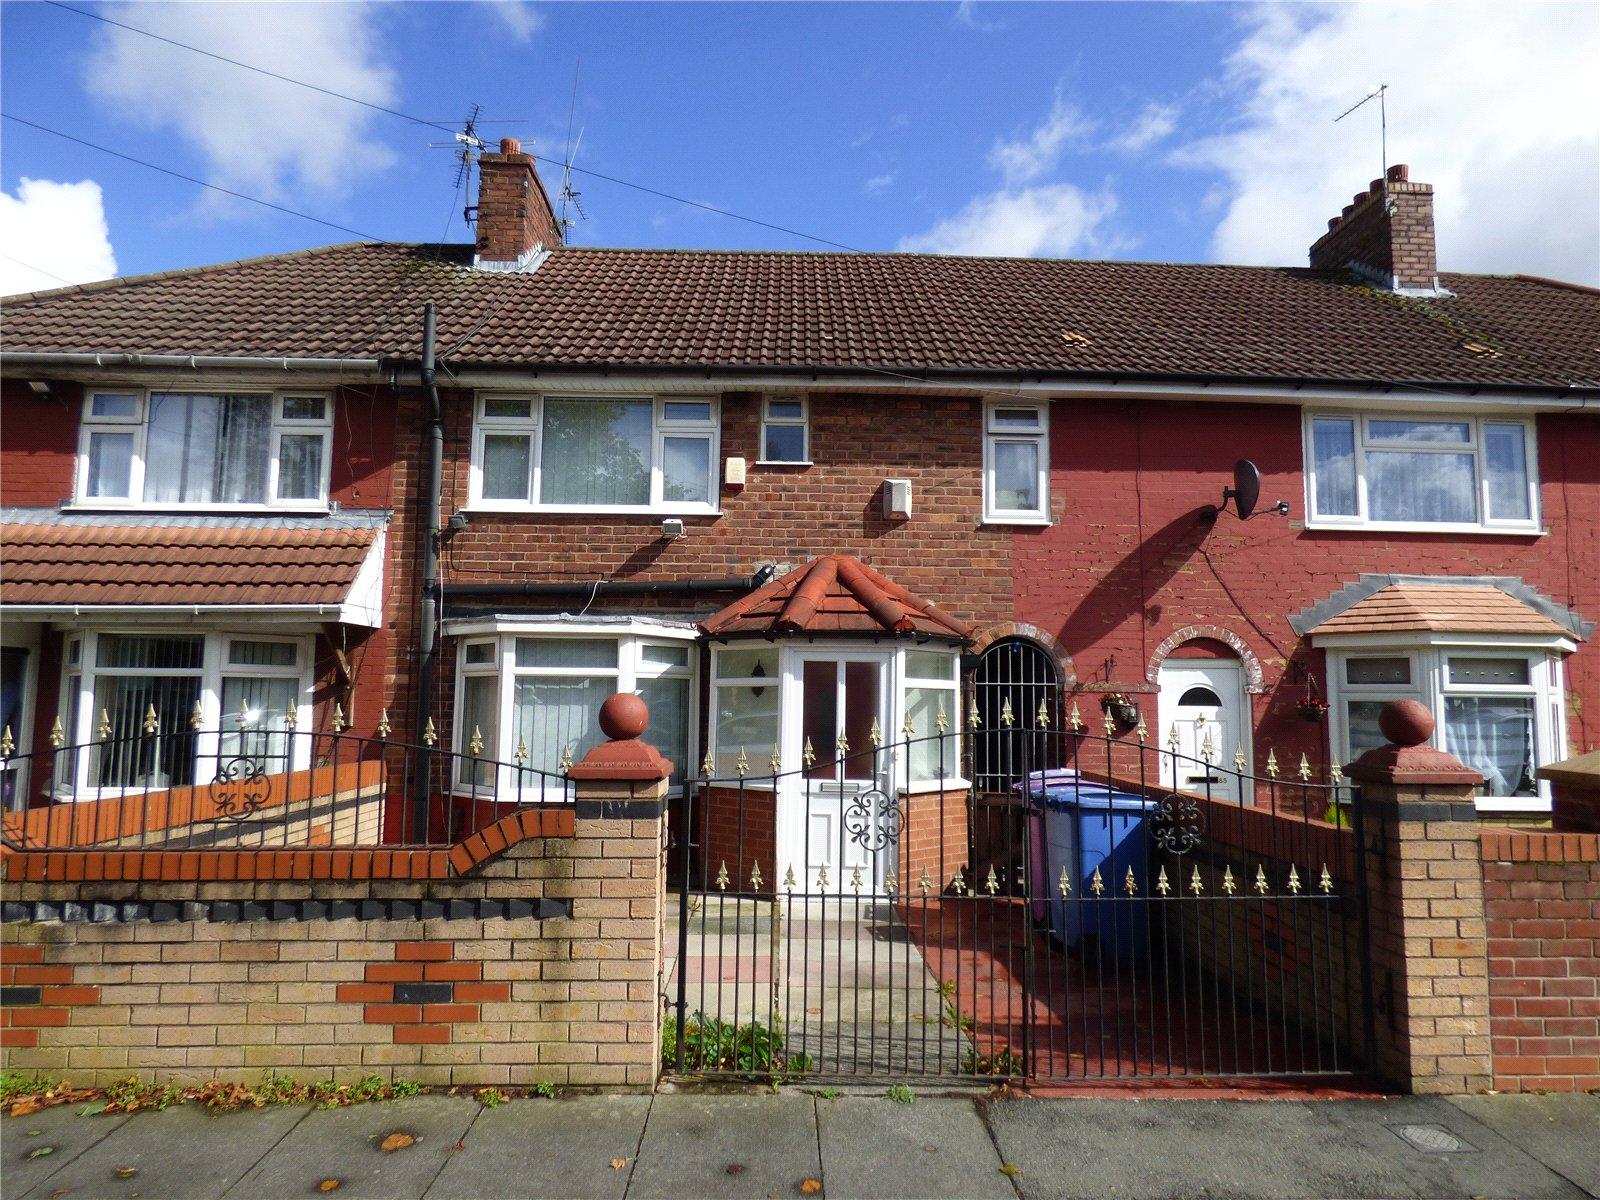 3 Bedrooms Terraced House for sale in Sedgemoor Road, Liverpool, Merseyside, L11